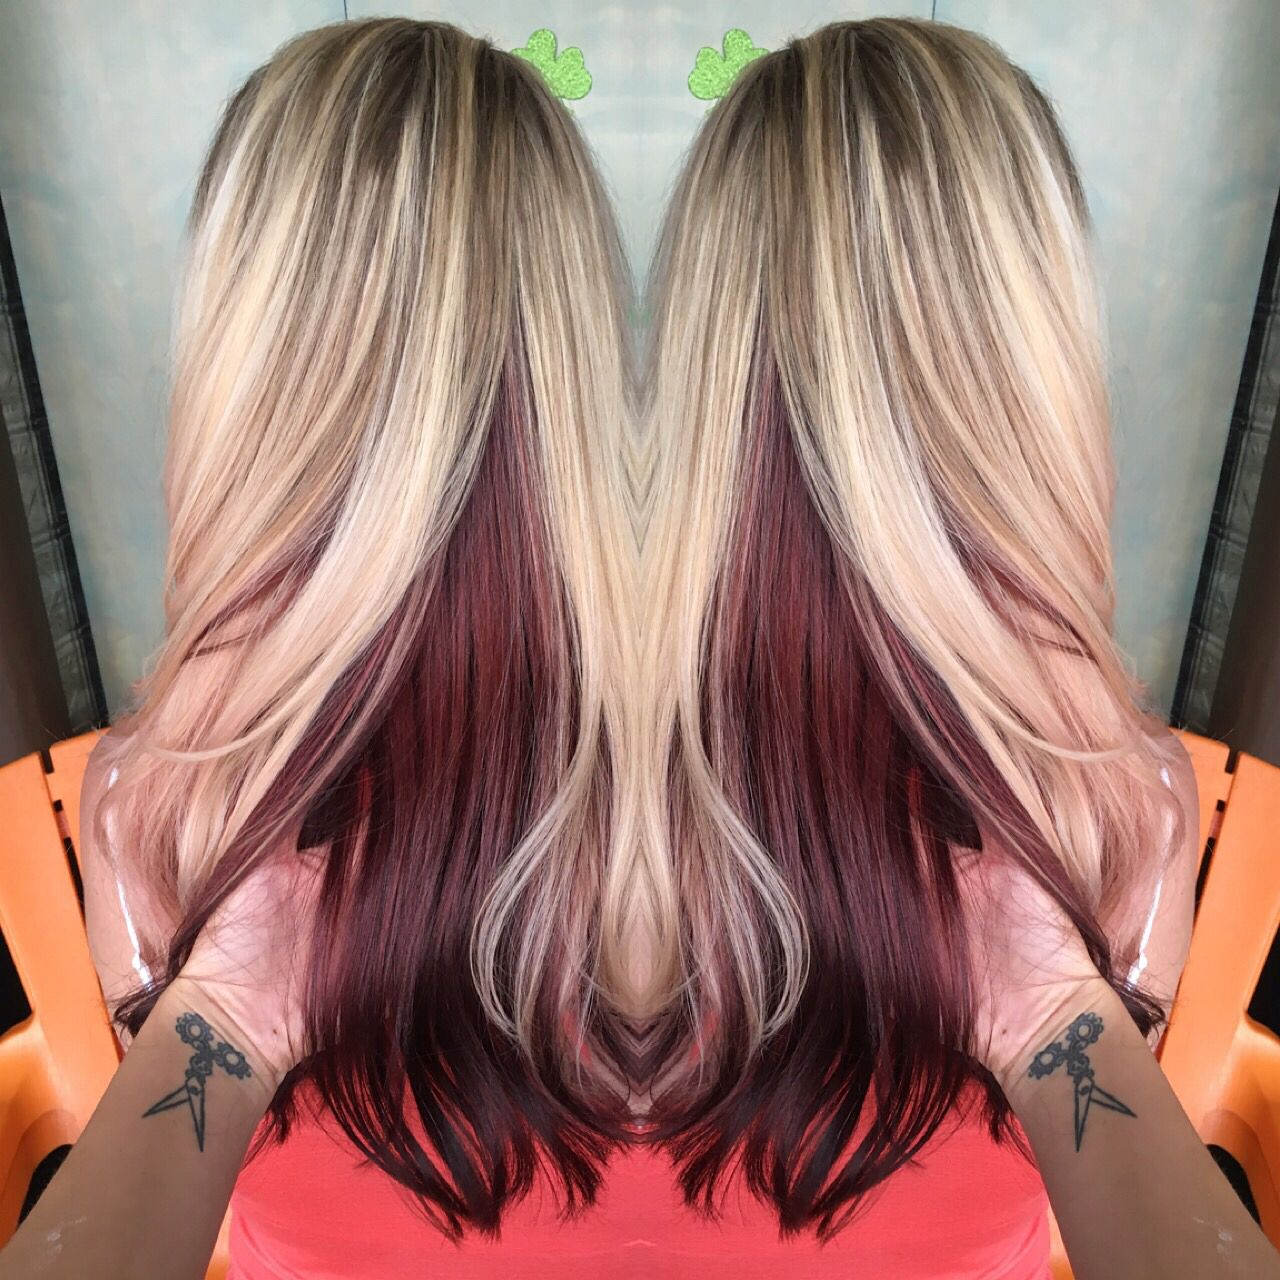 Blonde highlights with brown peekaboo